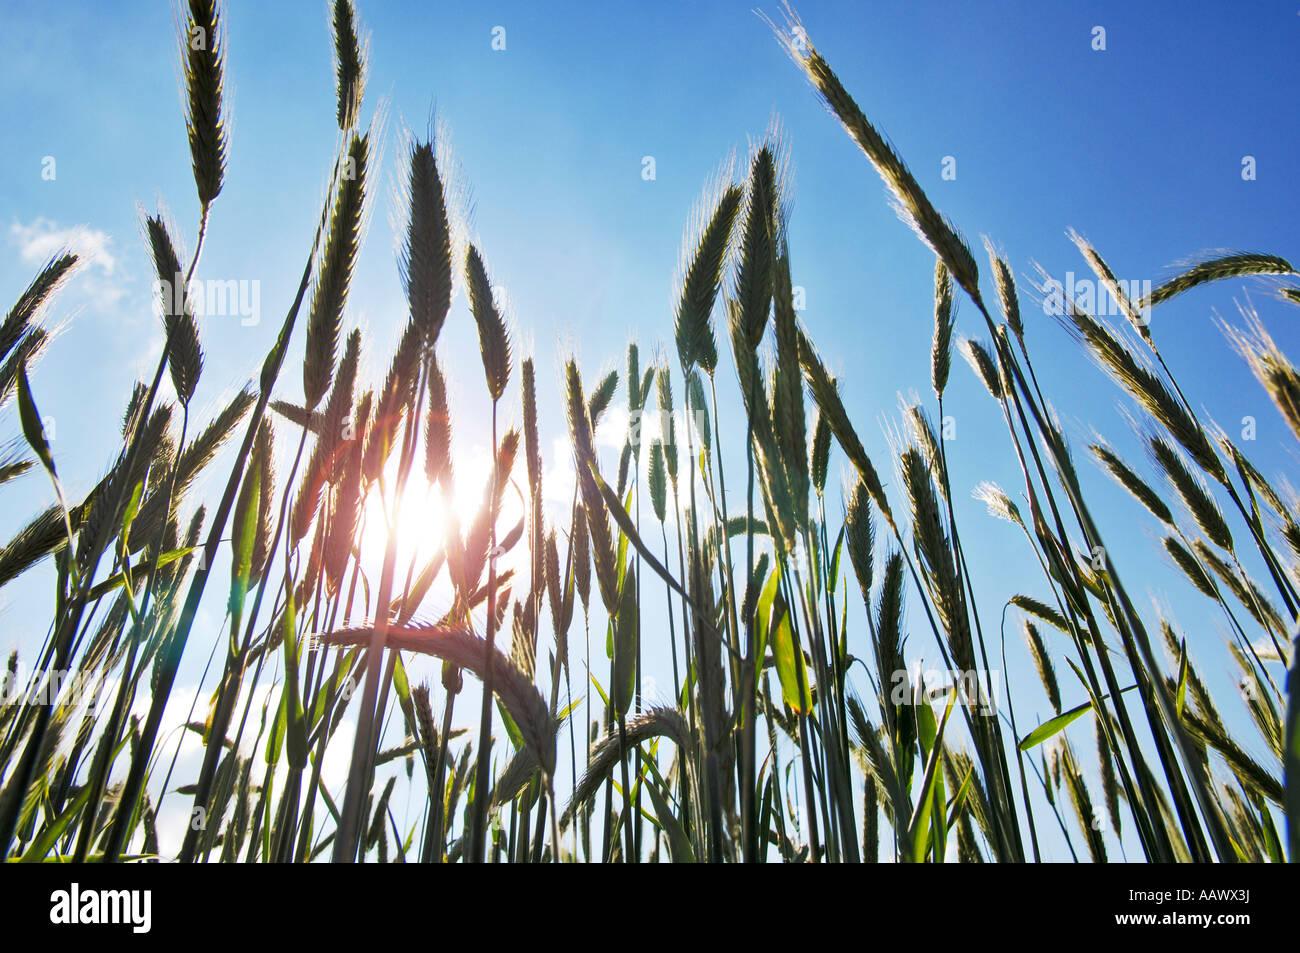 Grain ears - Stock Image